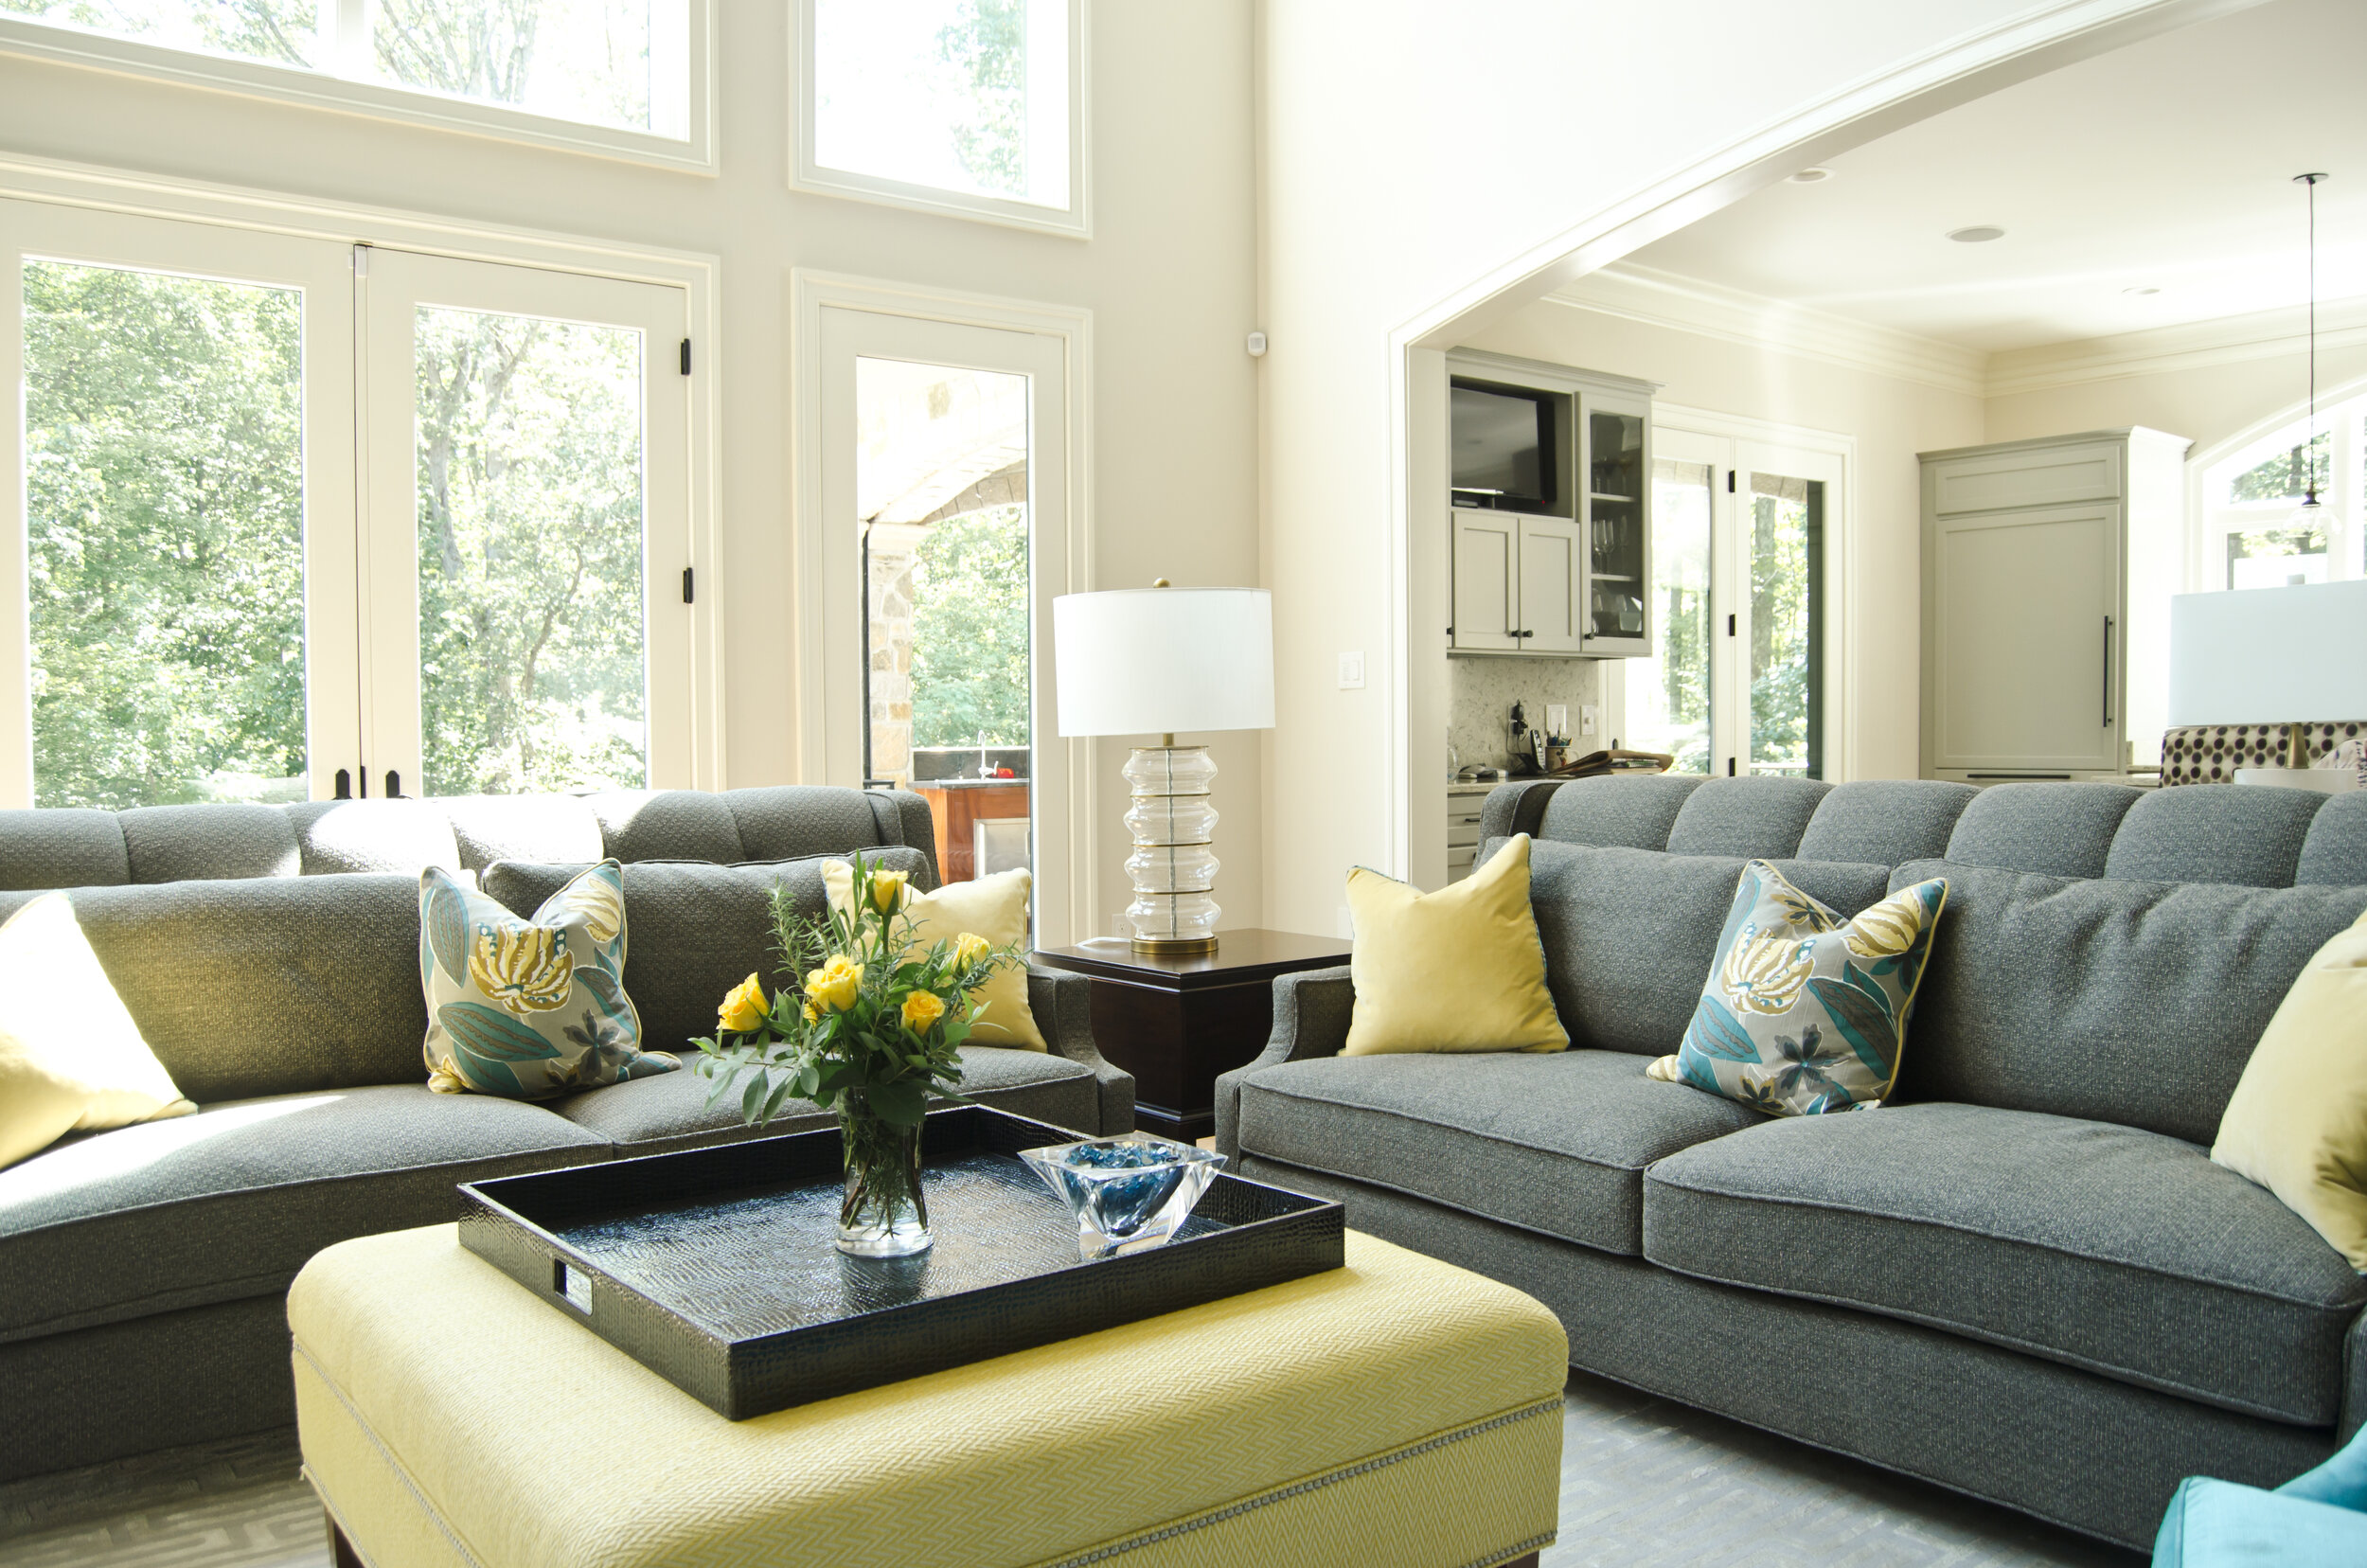 Kerry_Beth_Photo_Courtney_Ludeman_Interiors_Richmond_Interior_Designer_General_Contractor-36.jpg